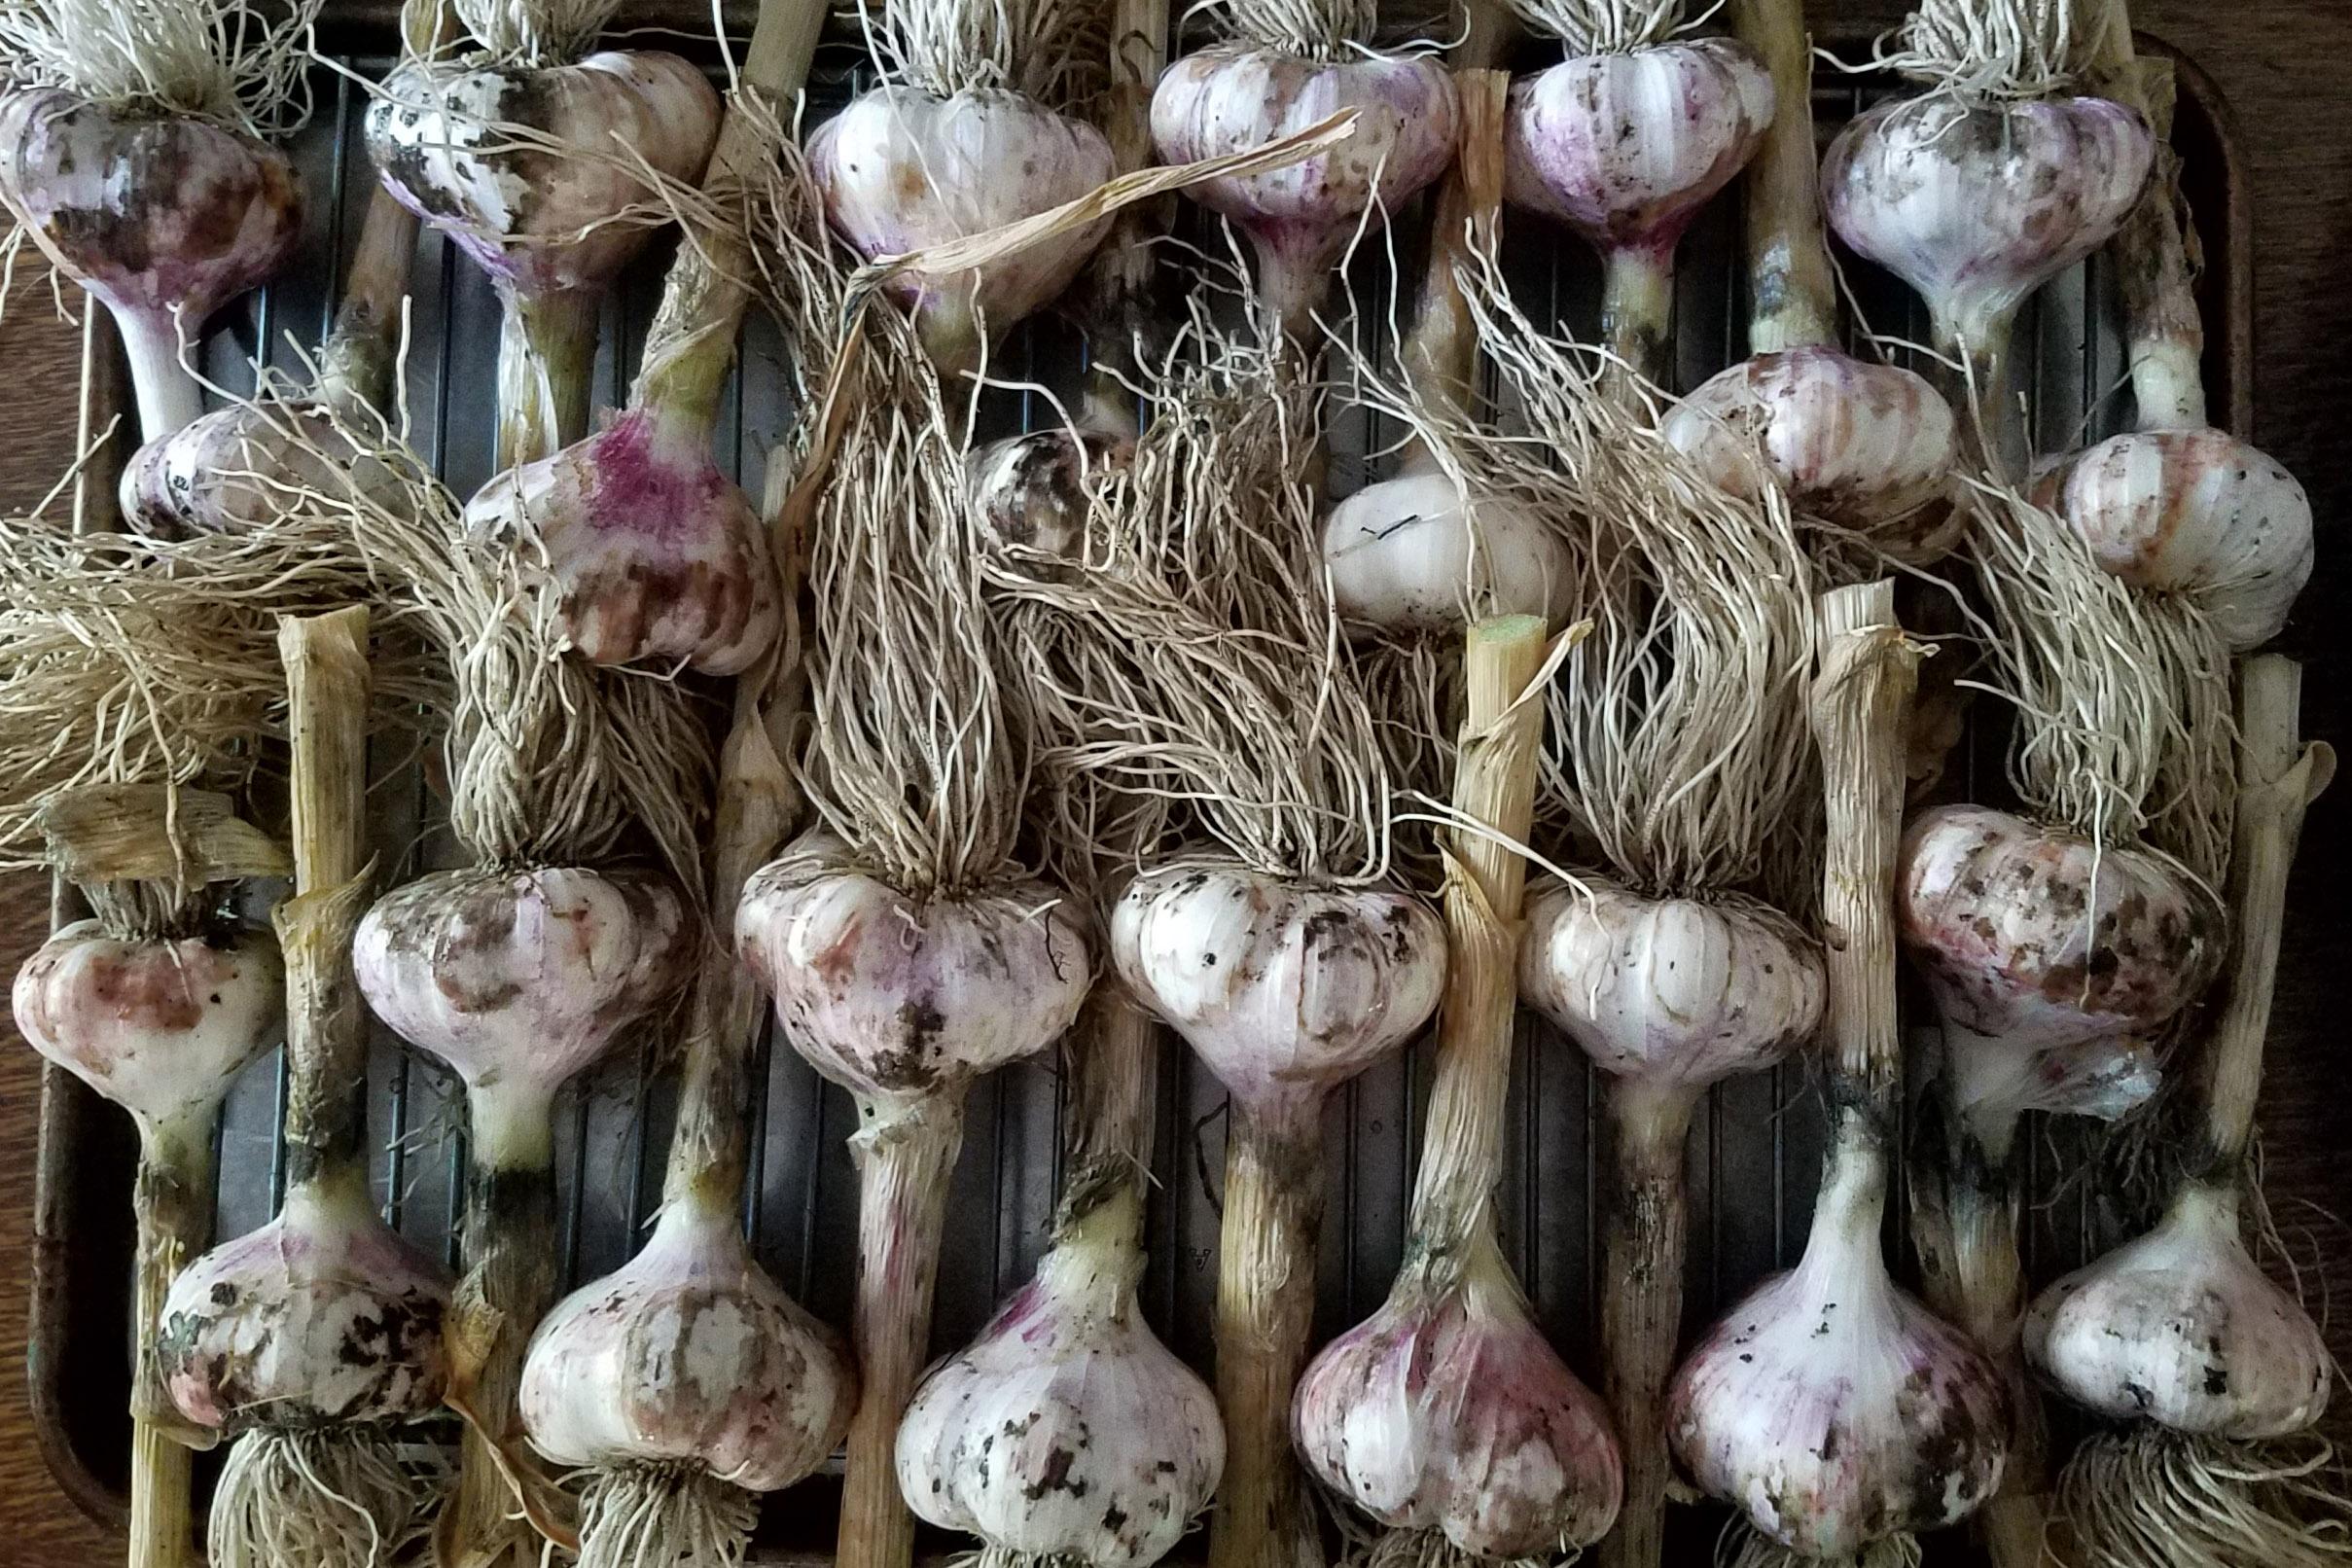 Growing garlic for beginners